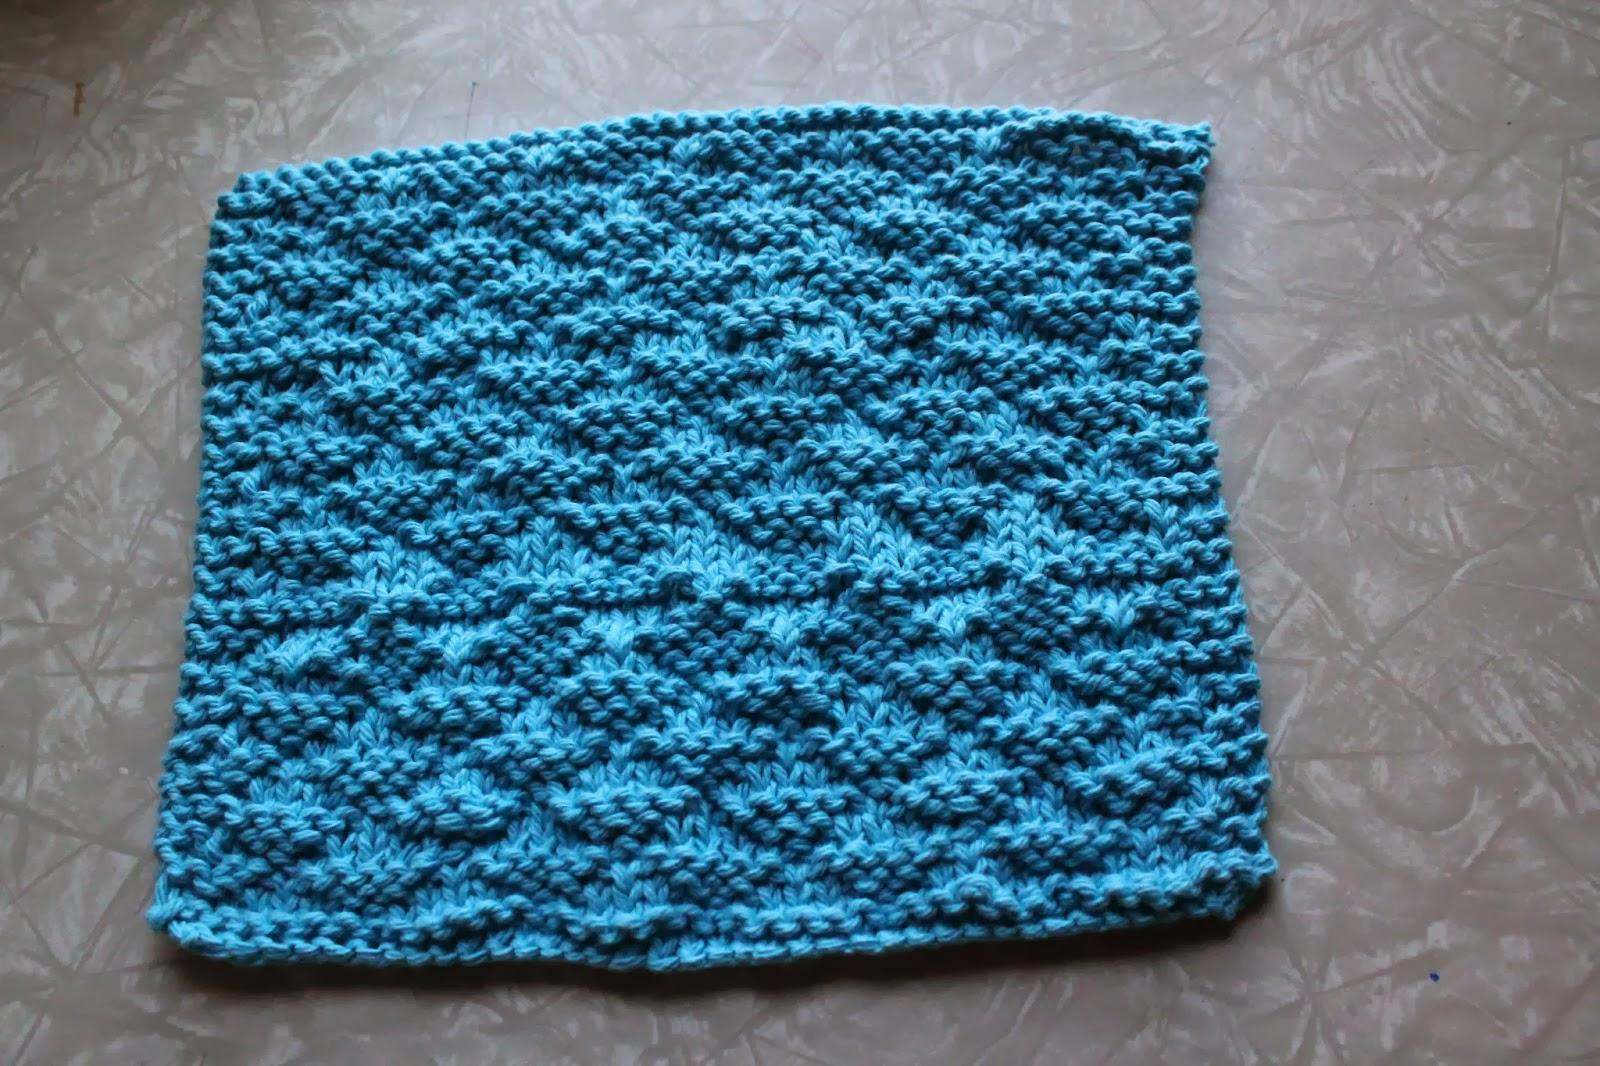 M Dishcloth Knitting Pattern : Everyday Life at Leisure: Weekly Dishcloth: Knitting the ...